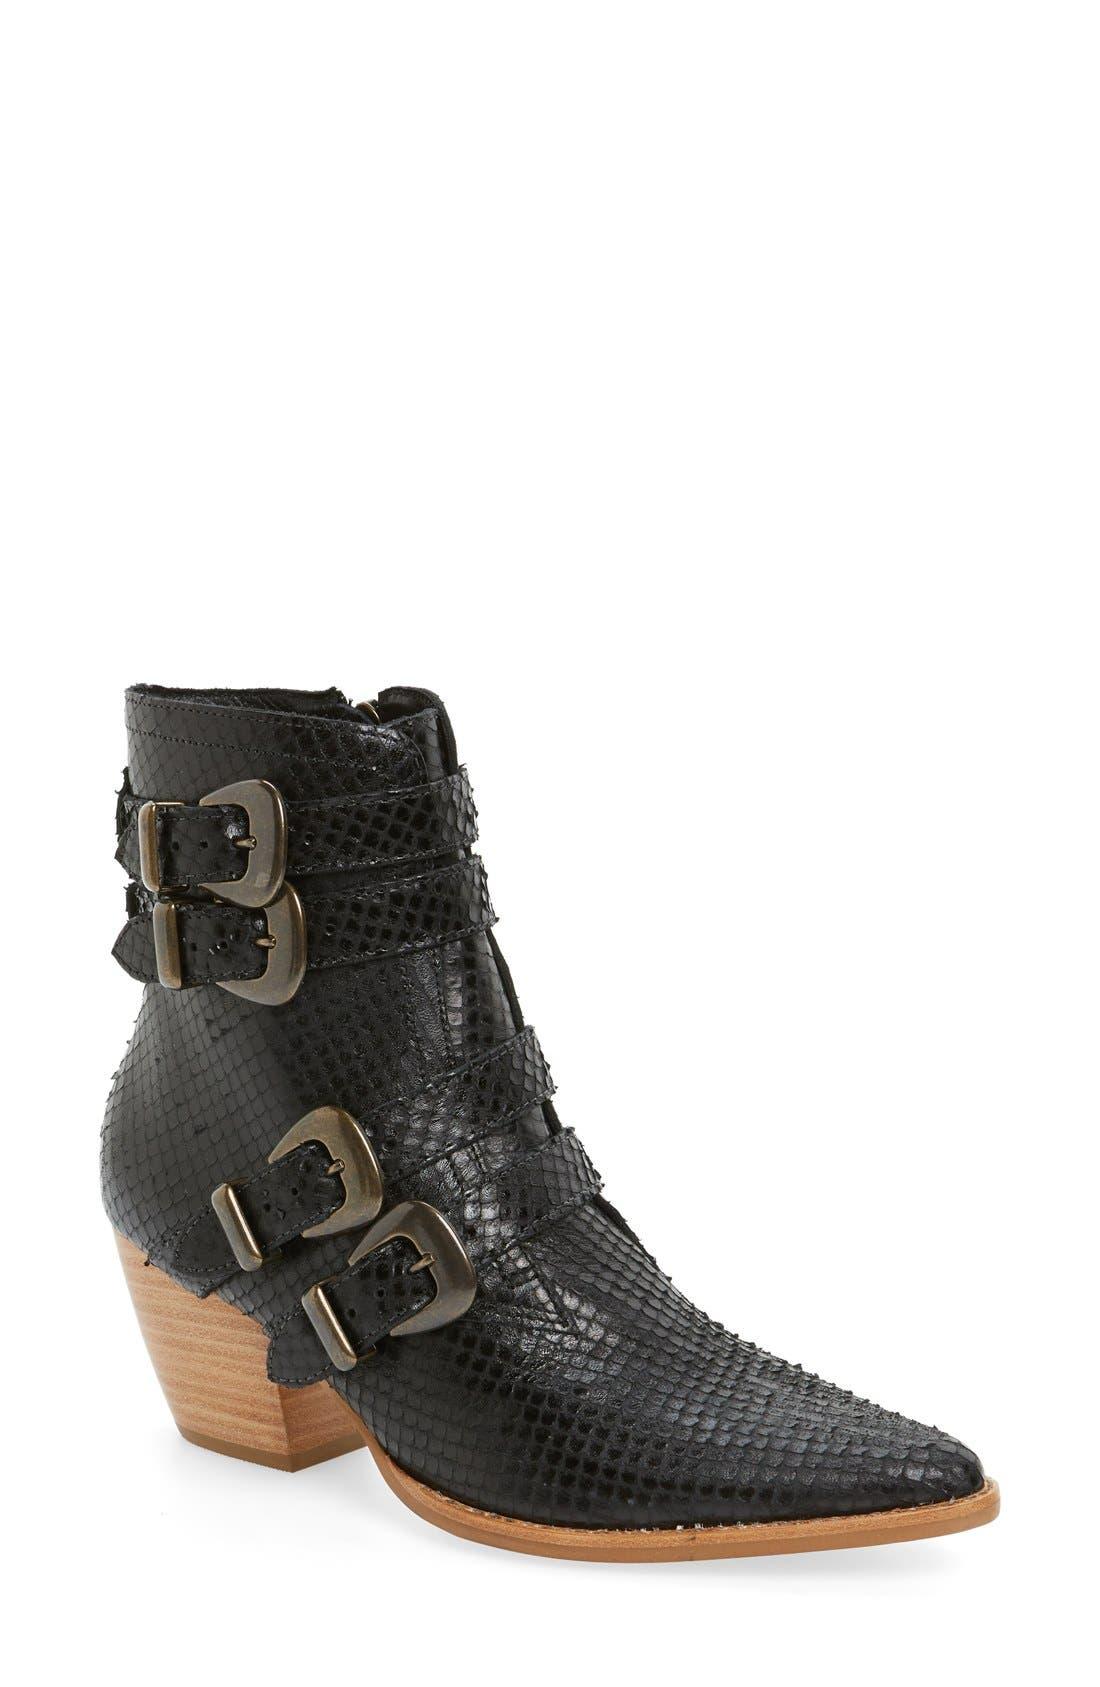 Main Image - Matisse 'Harvey' Embossed Buckle Boot (Women)